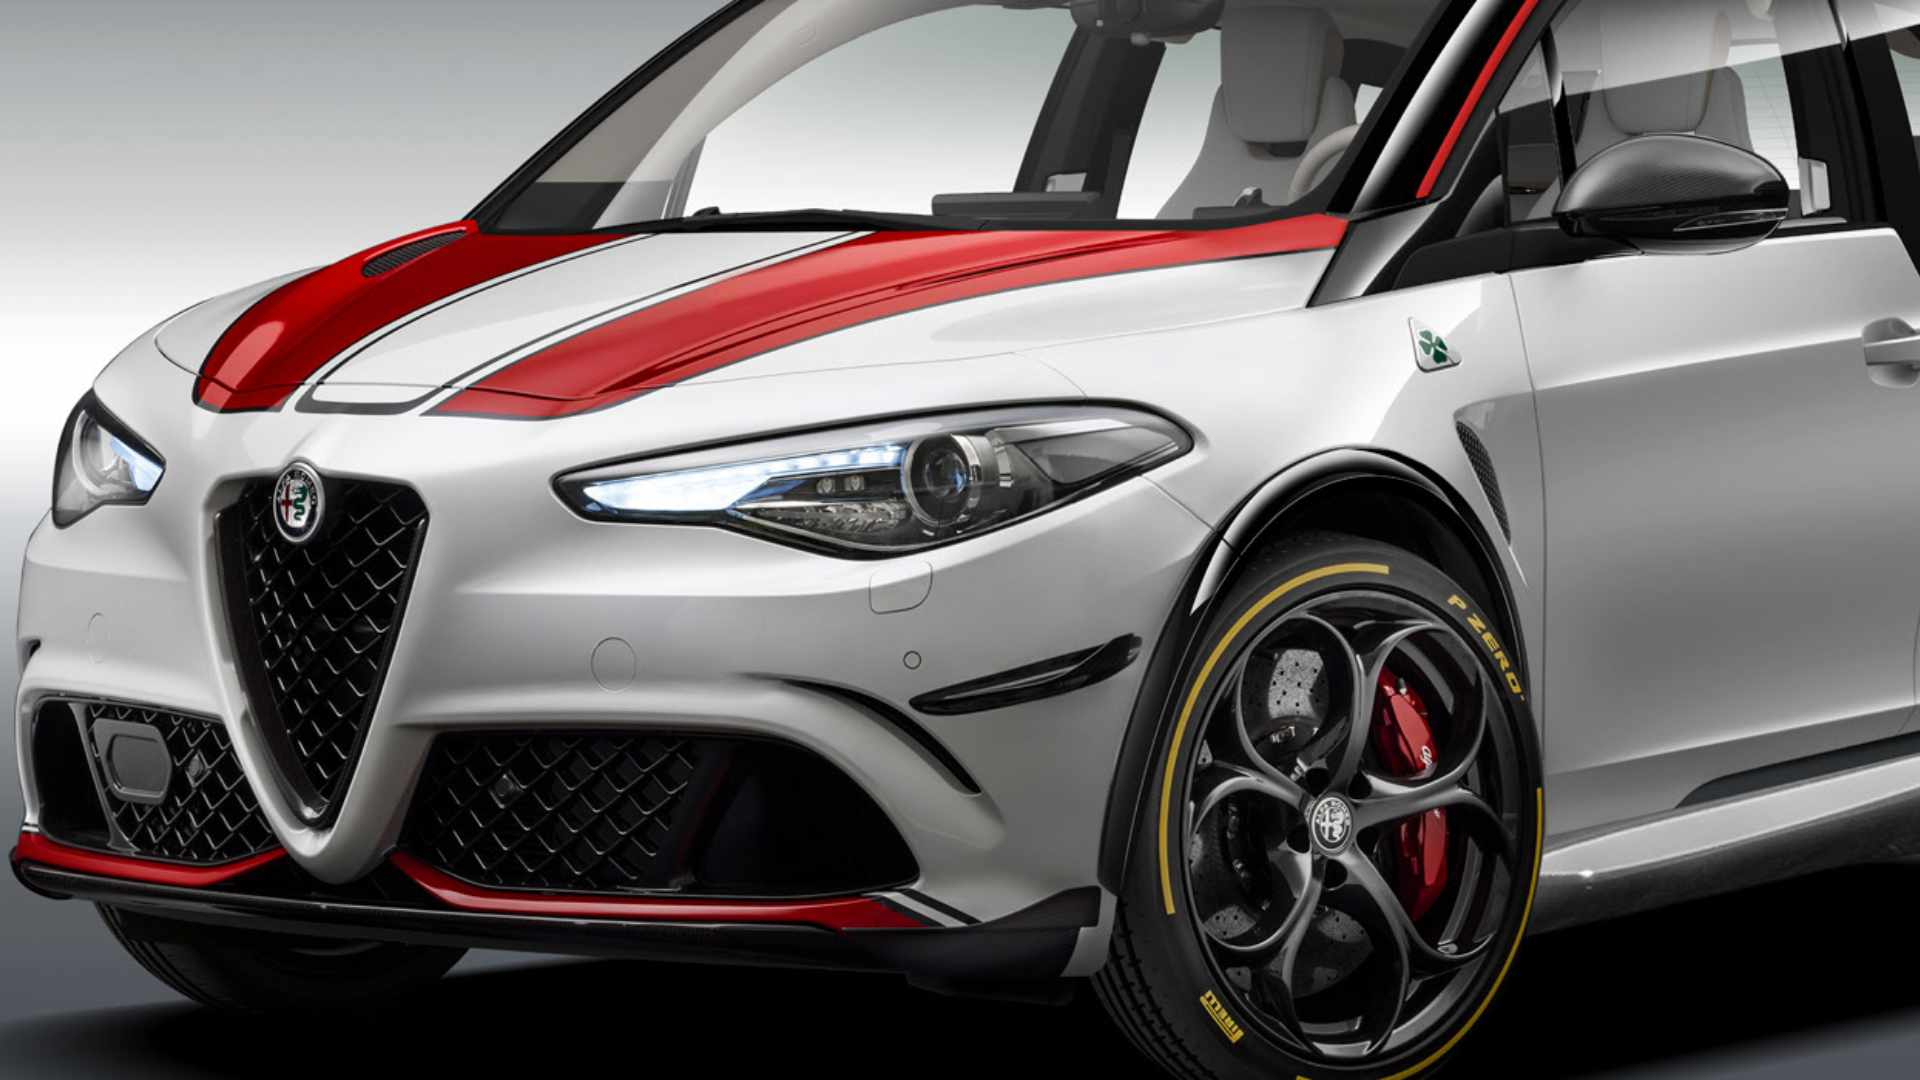 2021 Alfa Romeo City Hybrid Concept